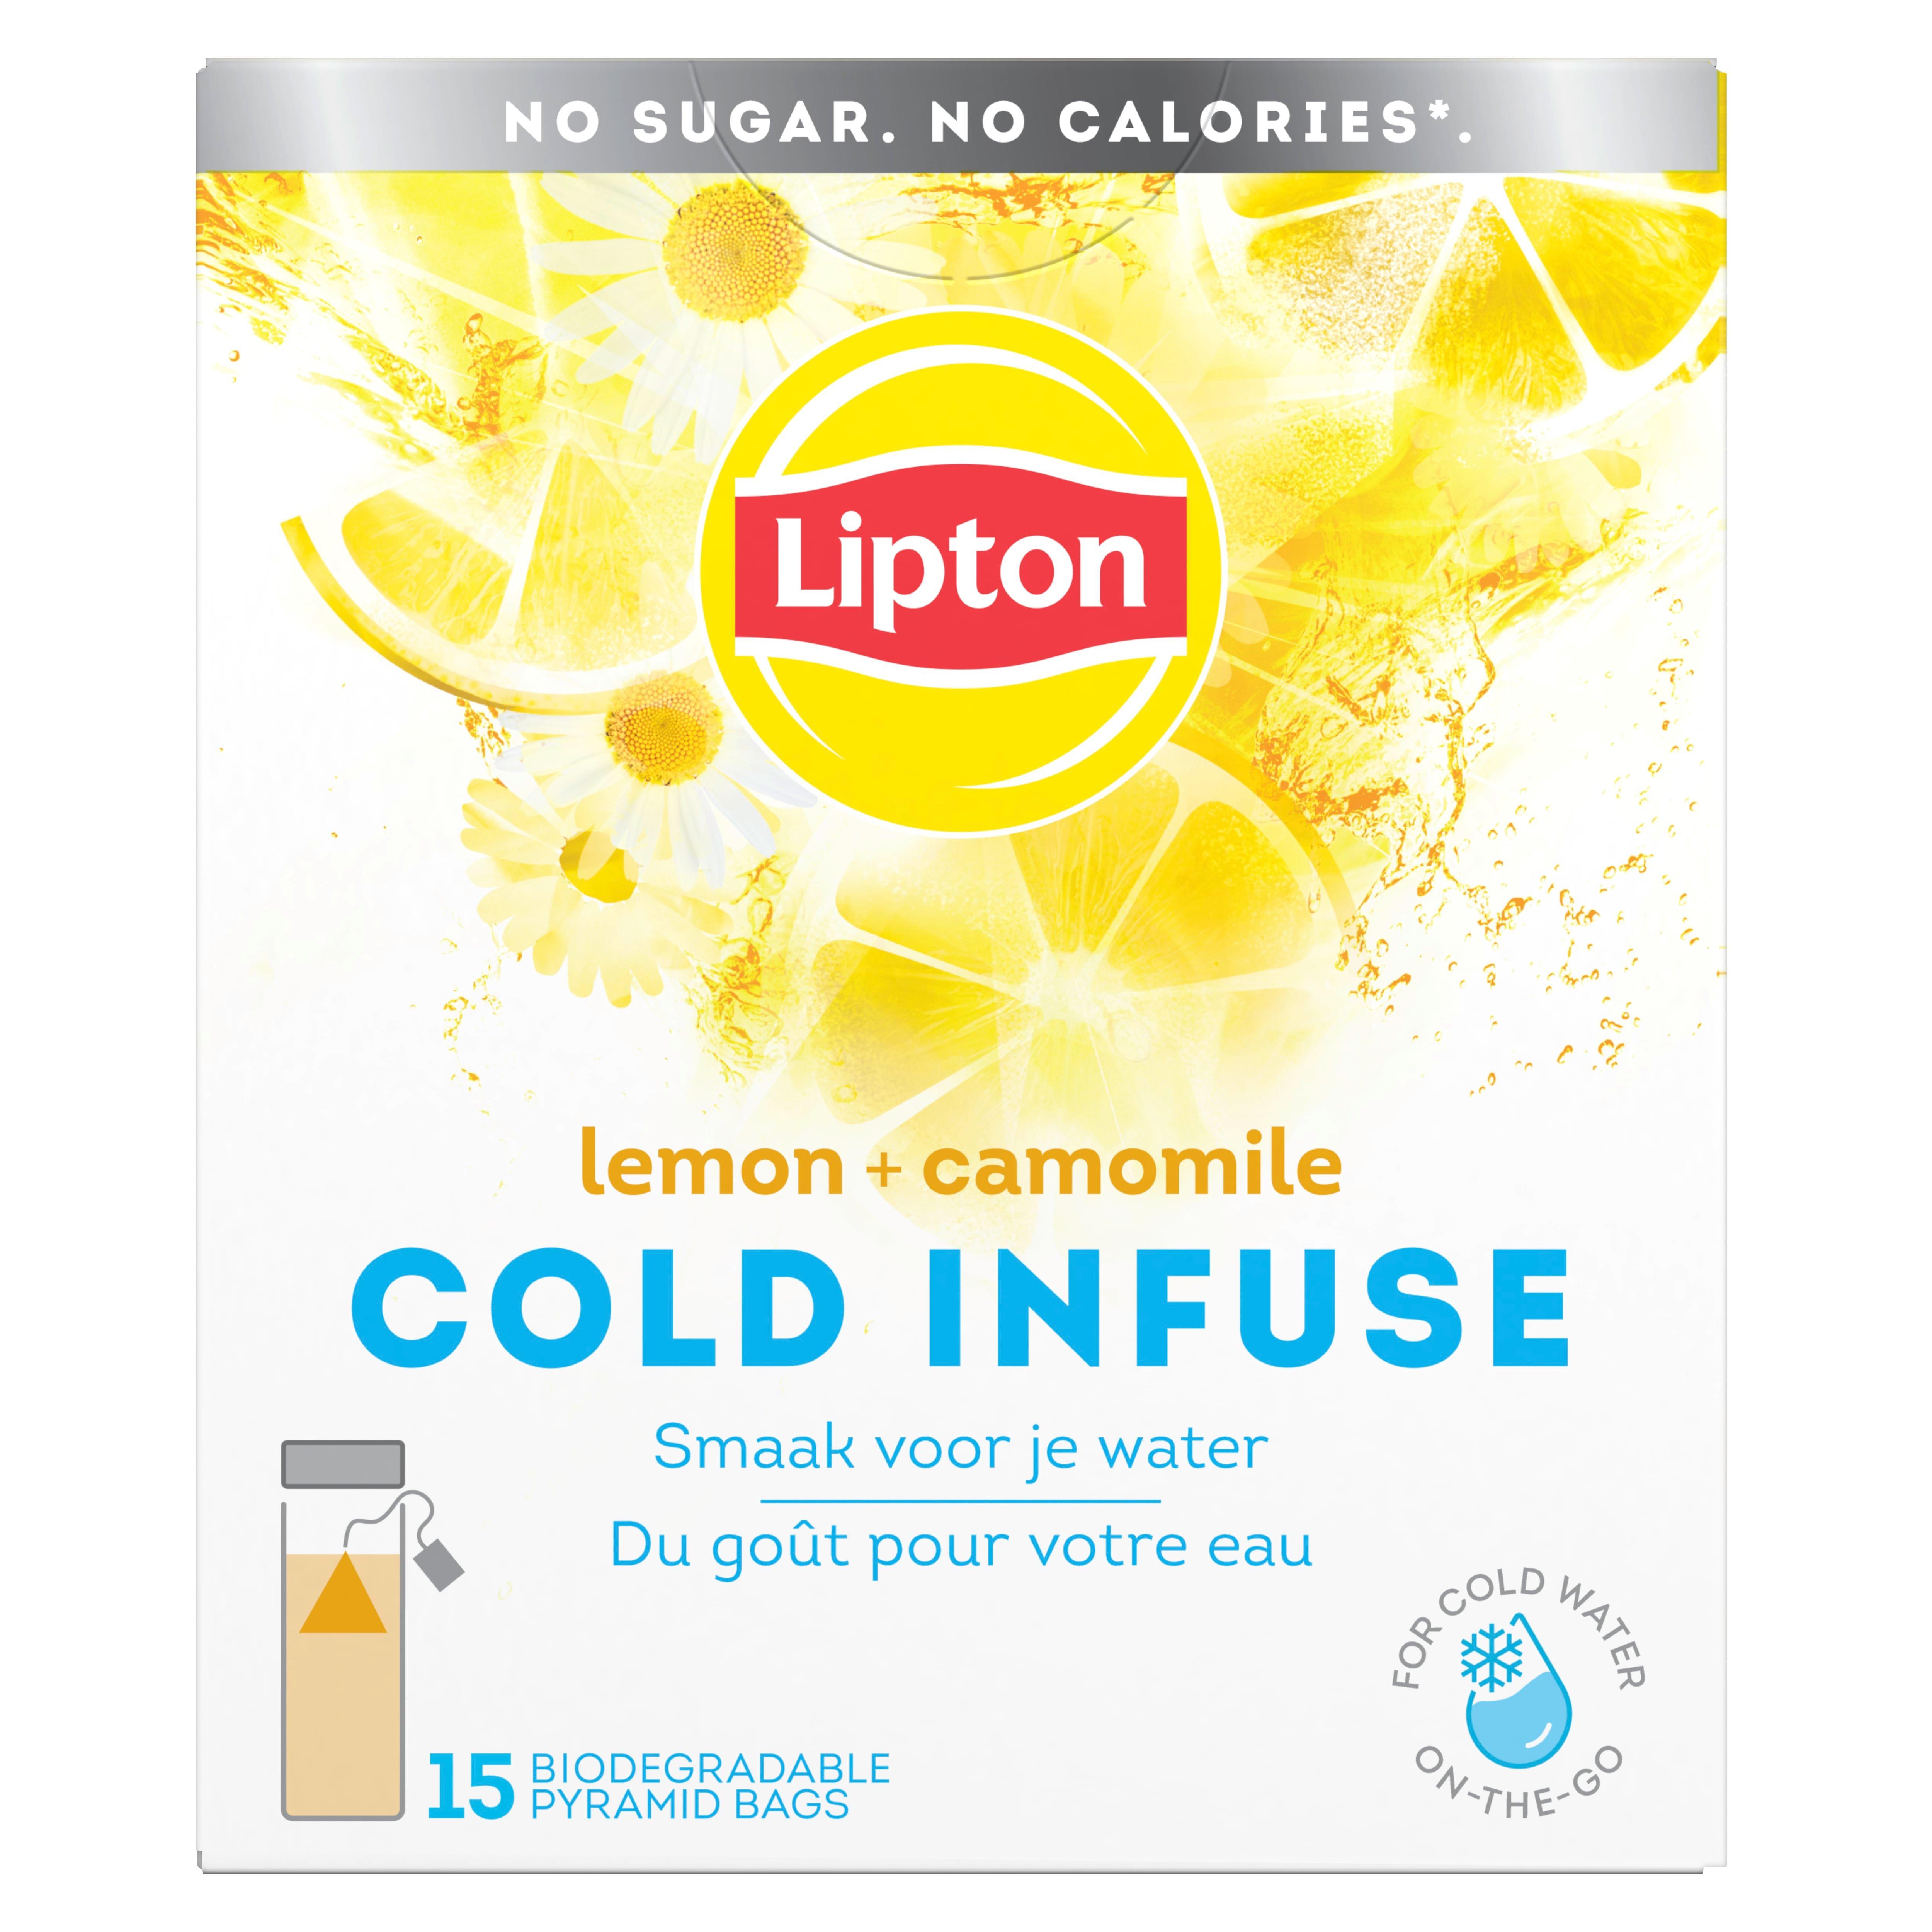 Lipton Cold Infuse Lemon Camomile -